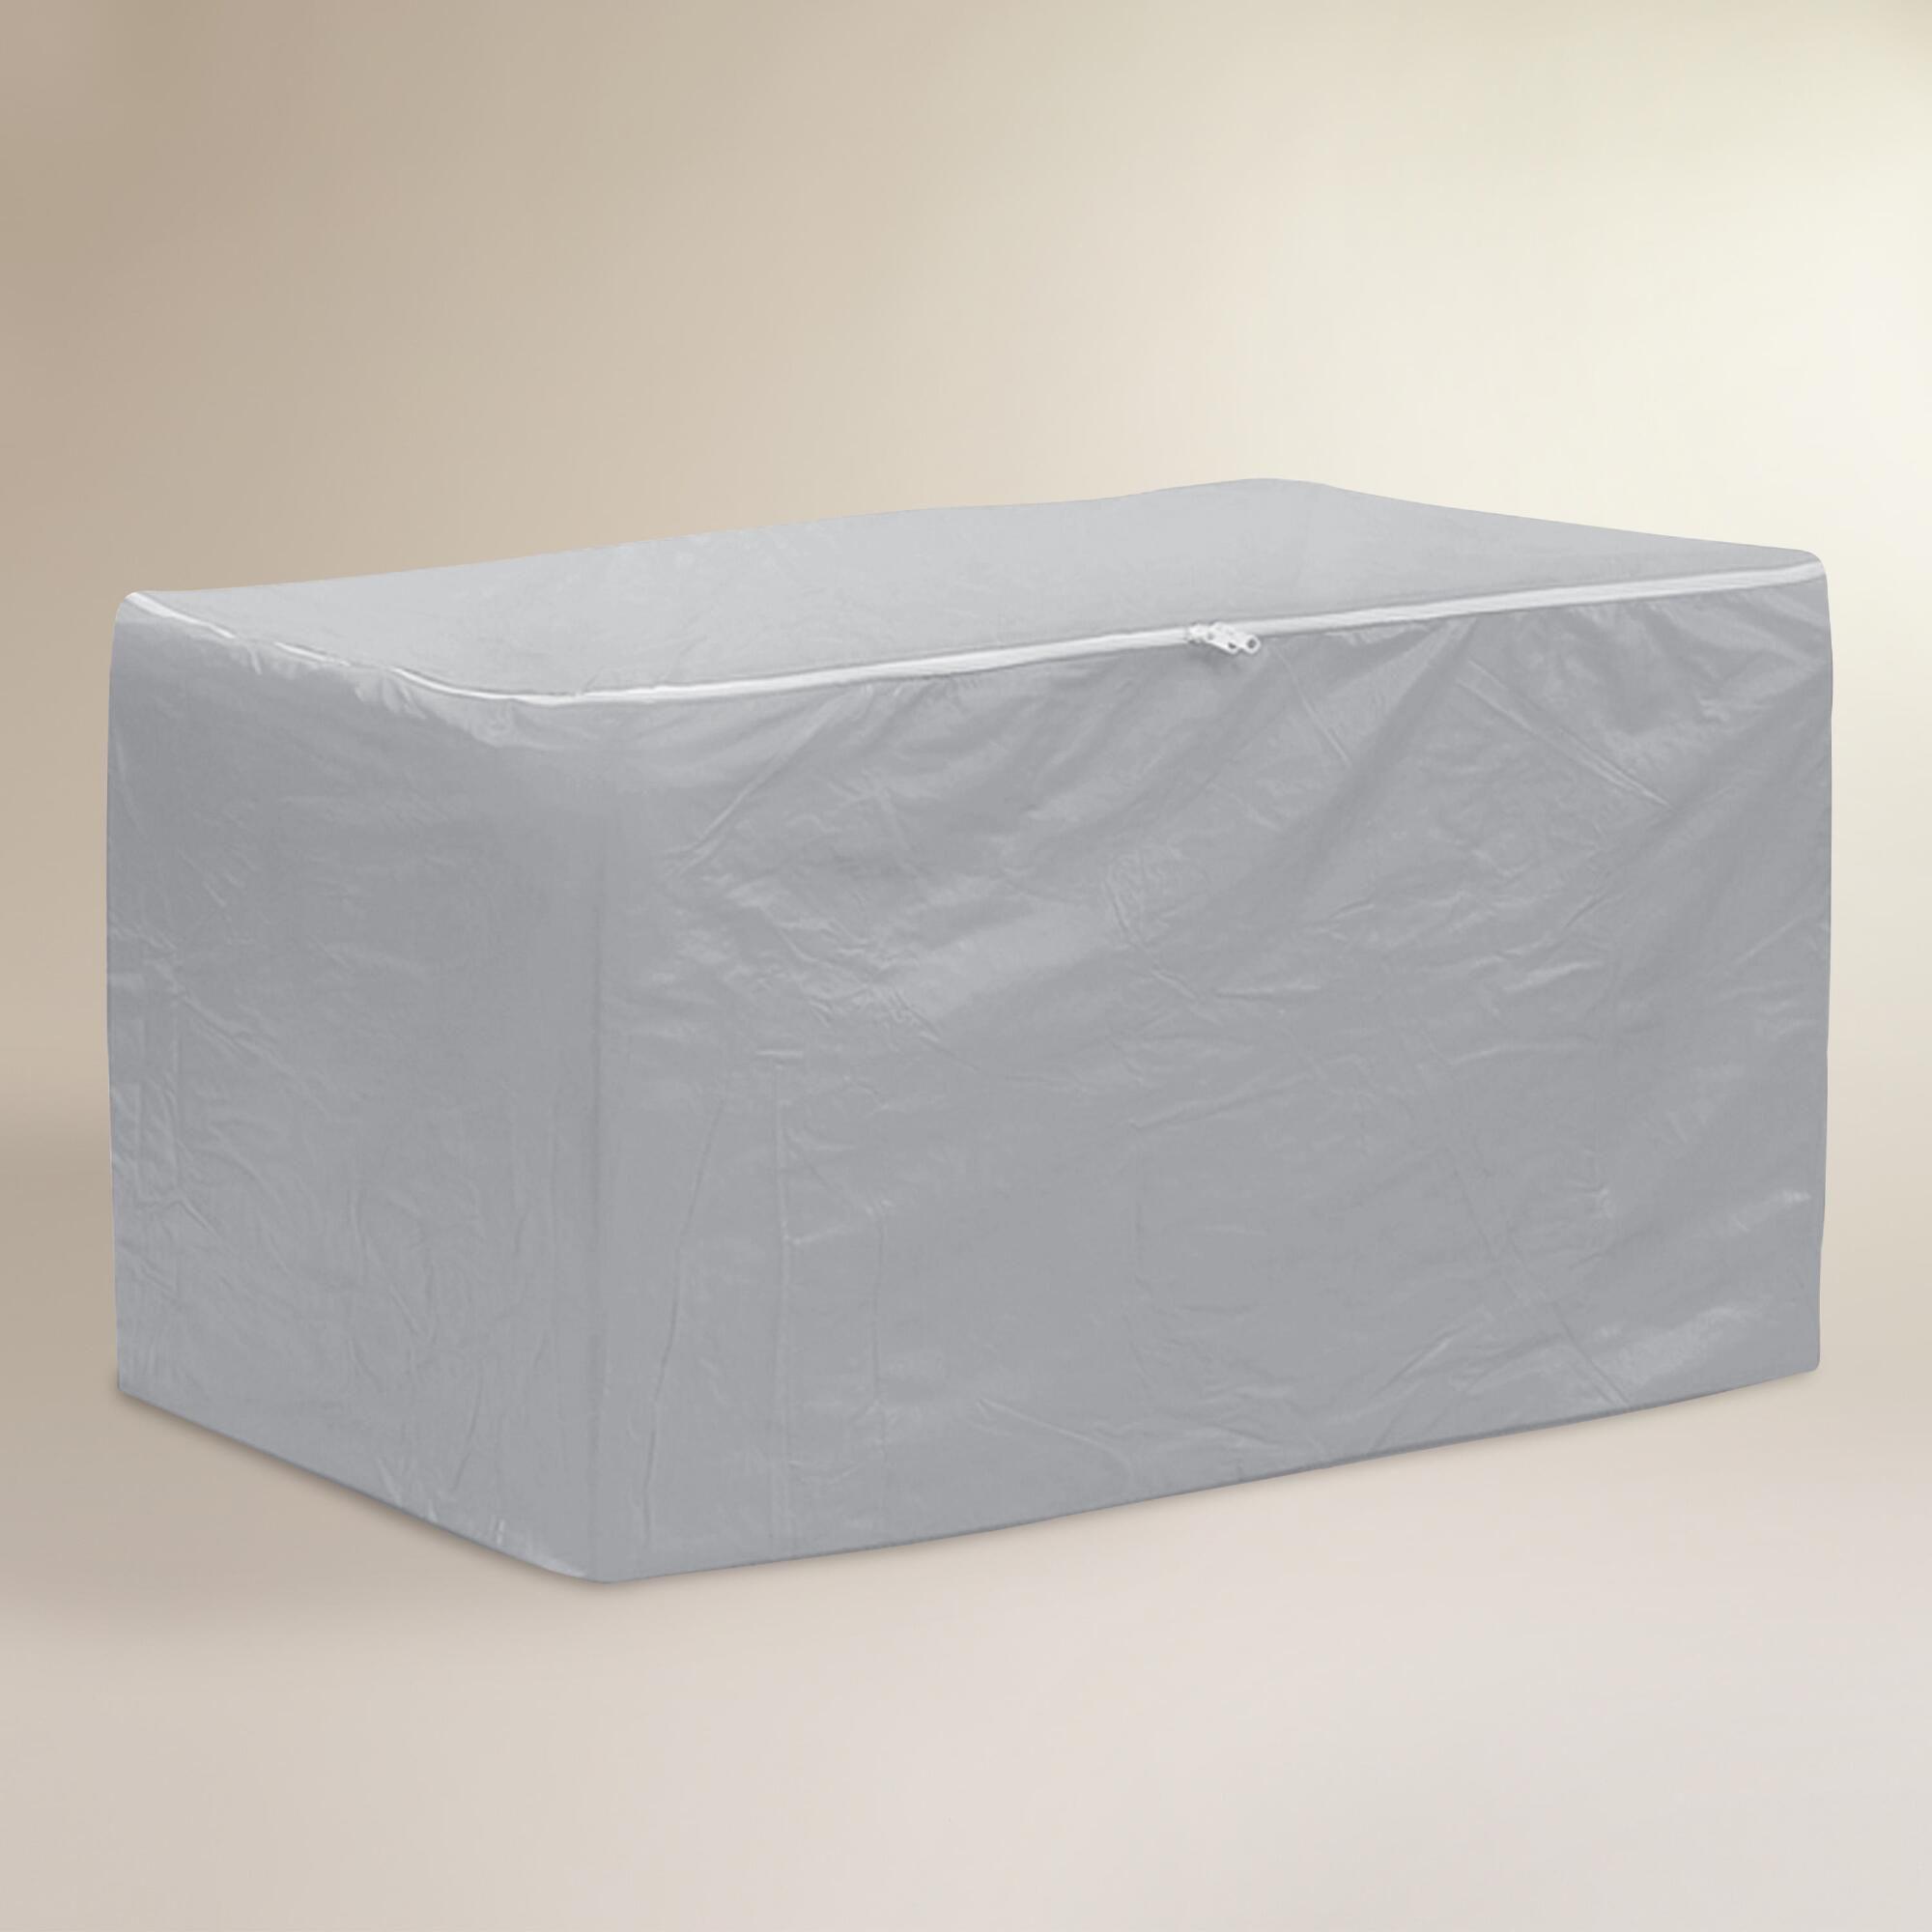 Outdoor Cushion Storage Bag Outdoor Cushions Waterproof